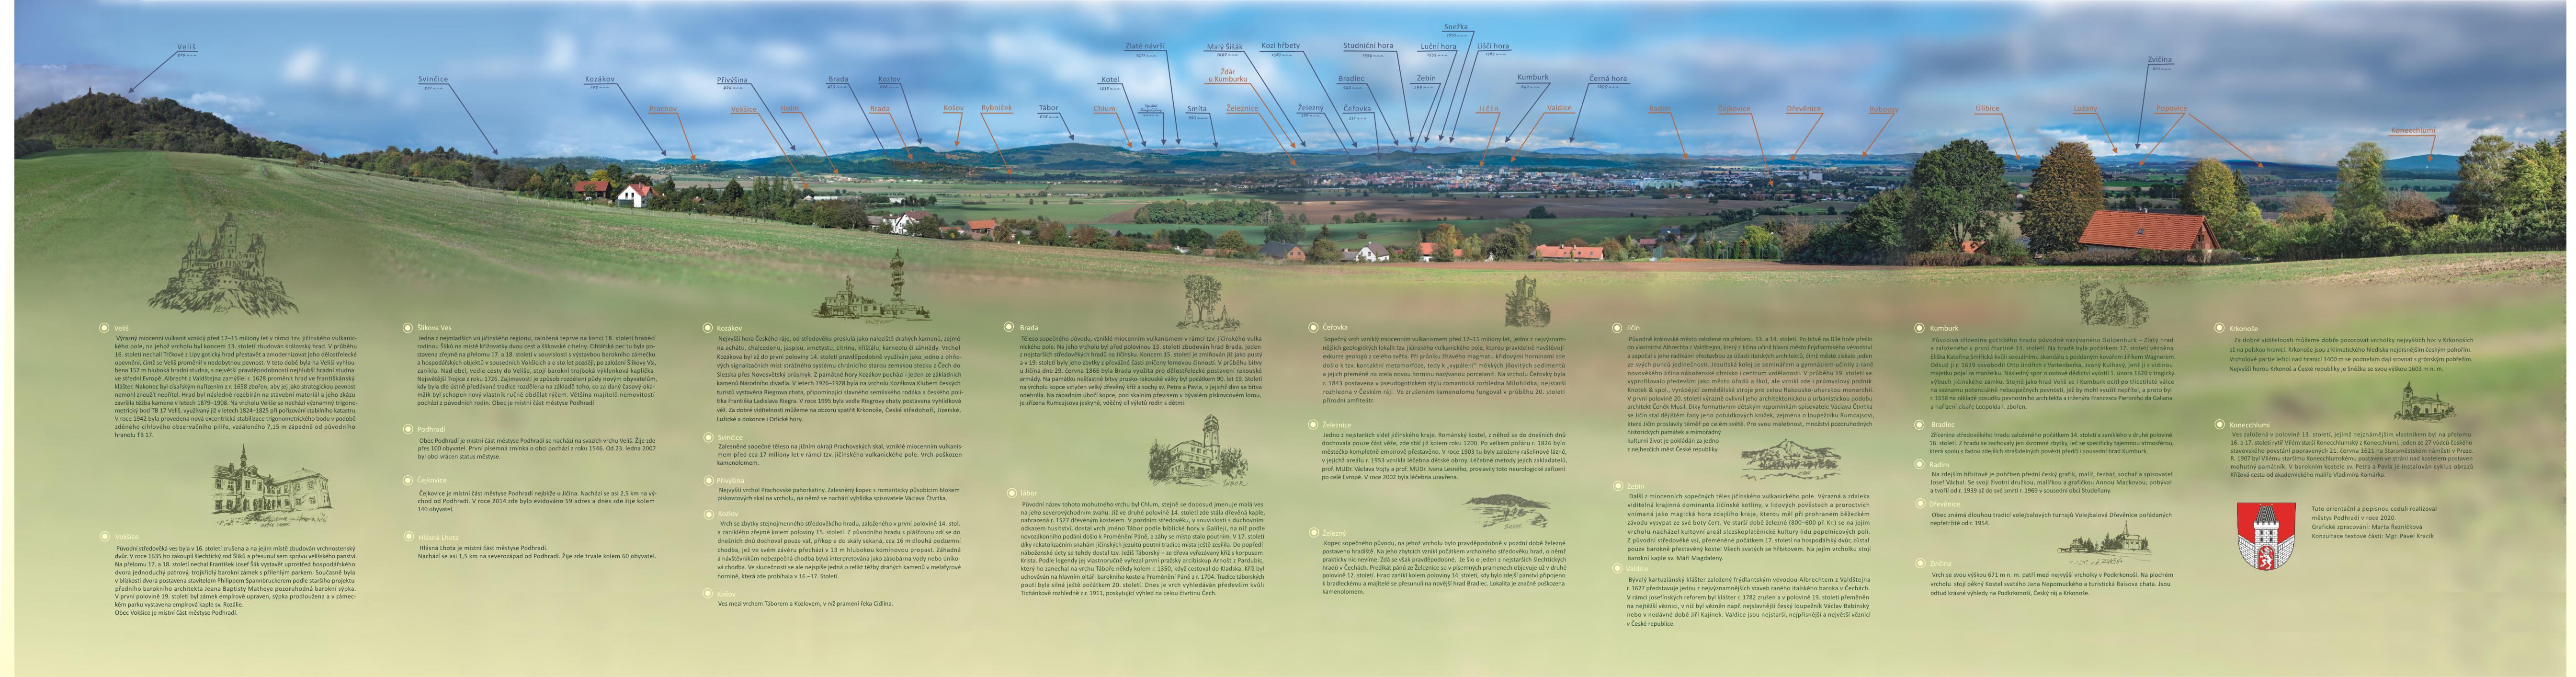 Výhled panoramata z Veliše 4x1m